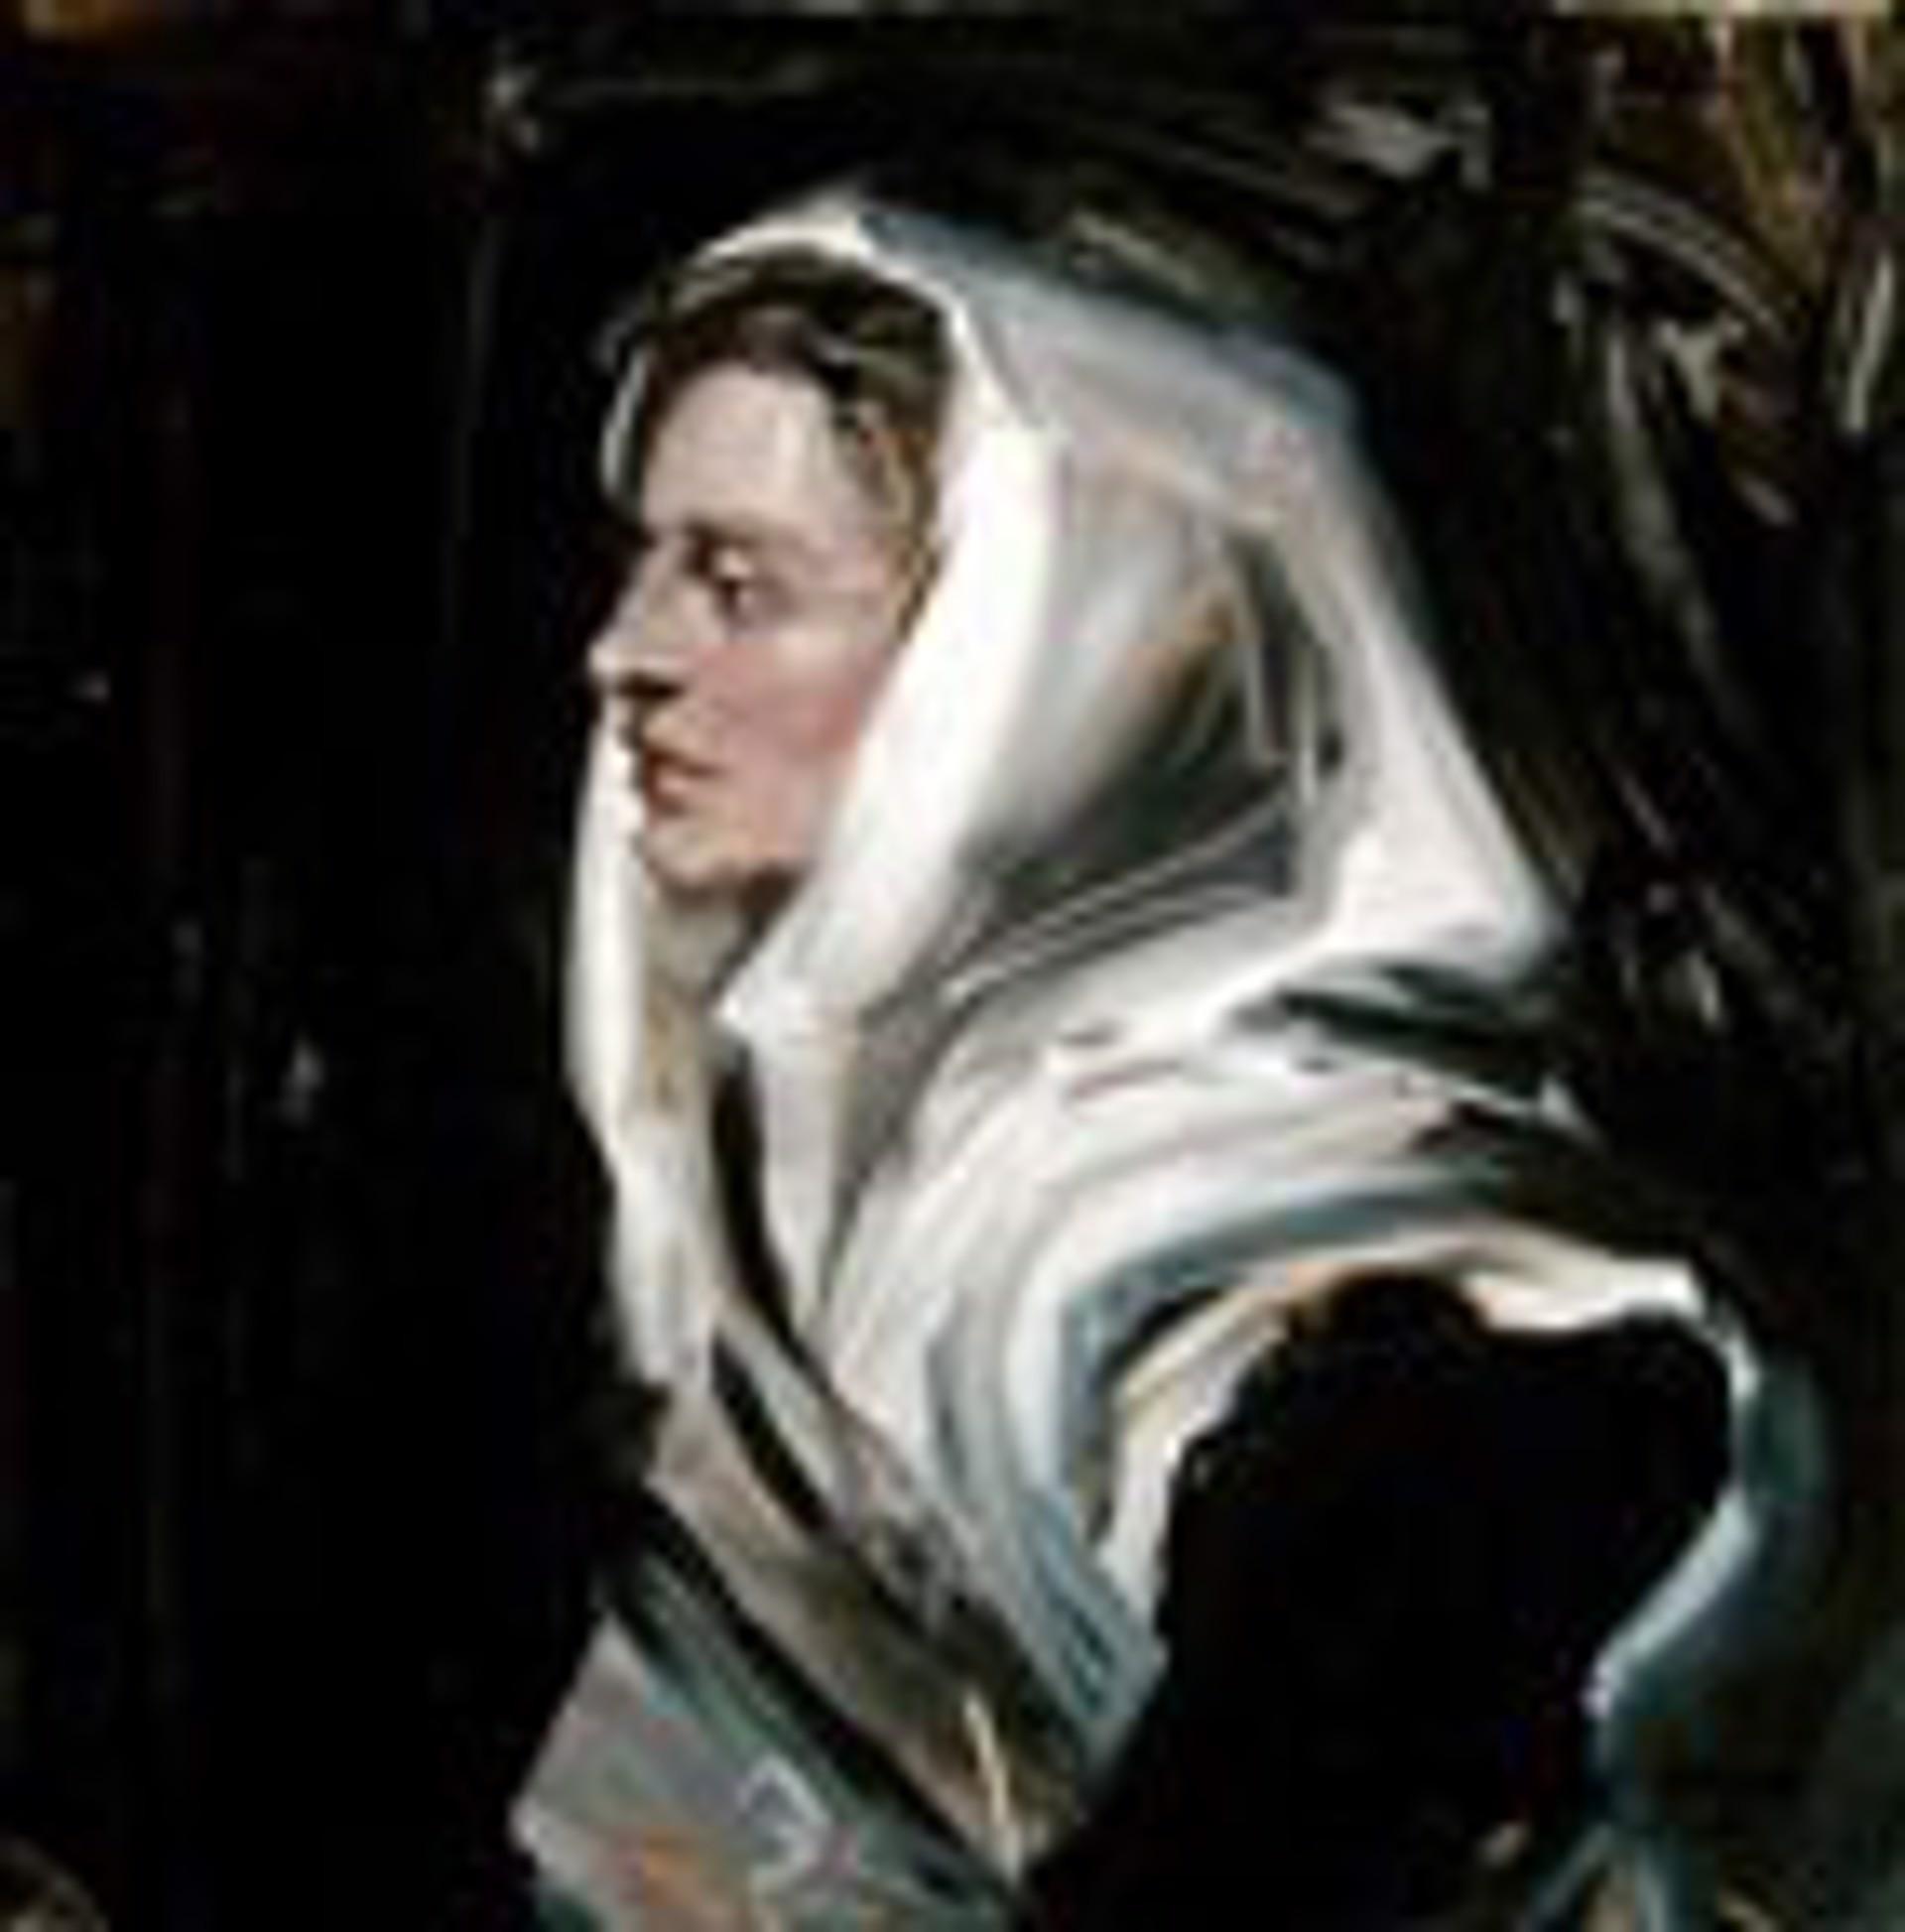 The White Shawl by Frank Mason (1921 - 2009)